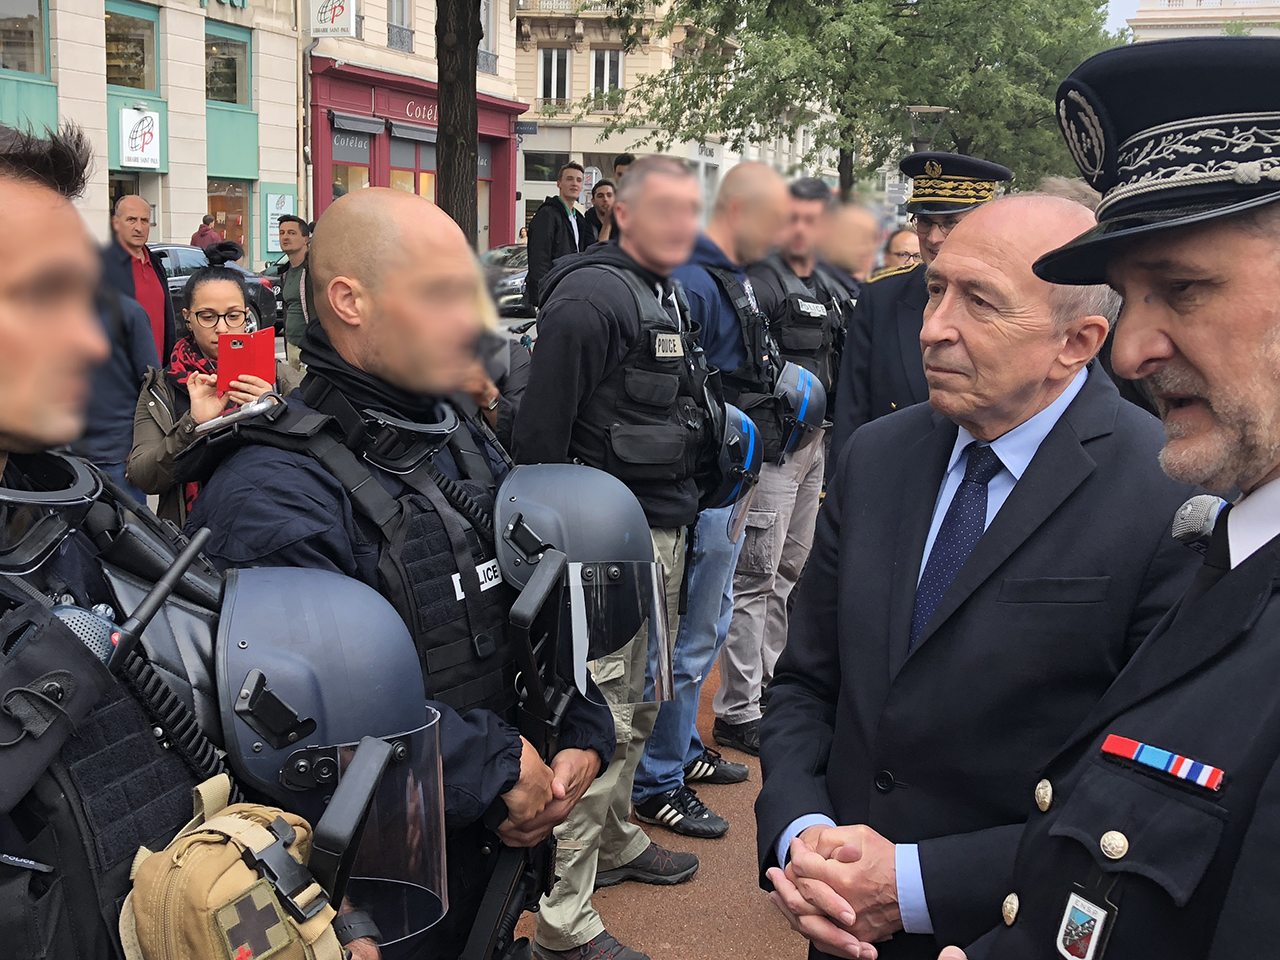 Affaire Benalla: Macron garde le silence mais la pression monte